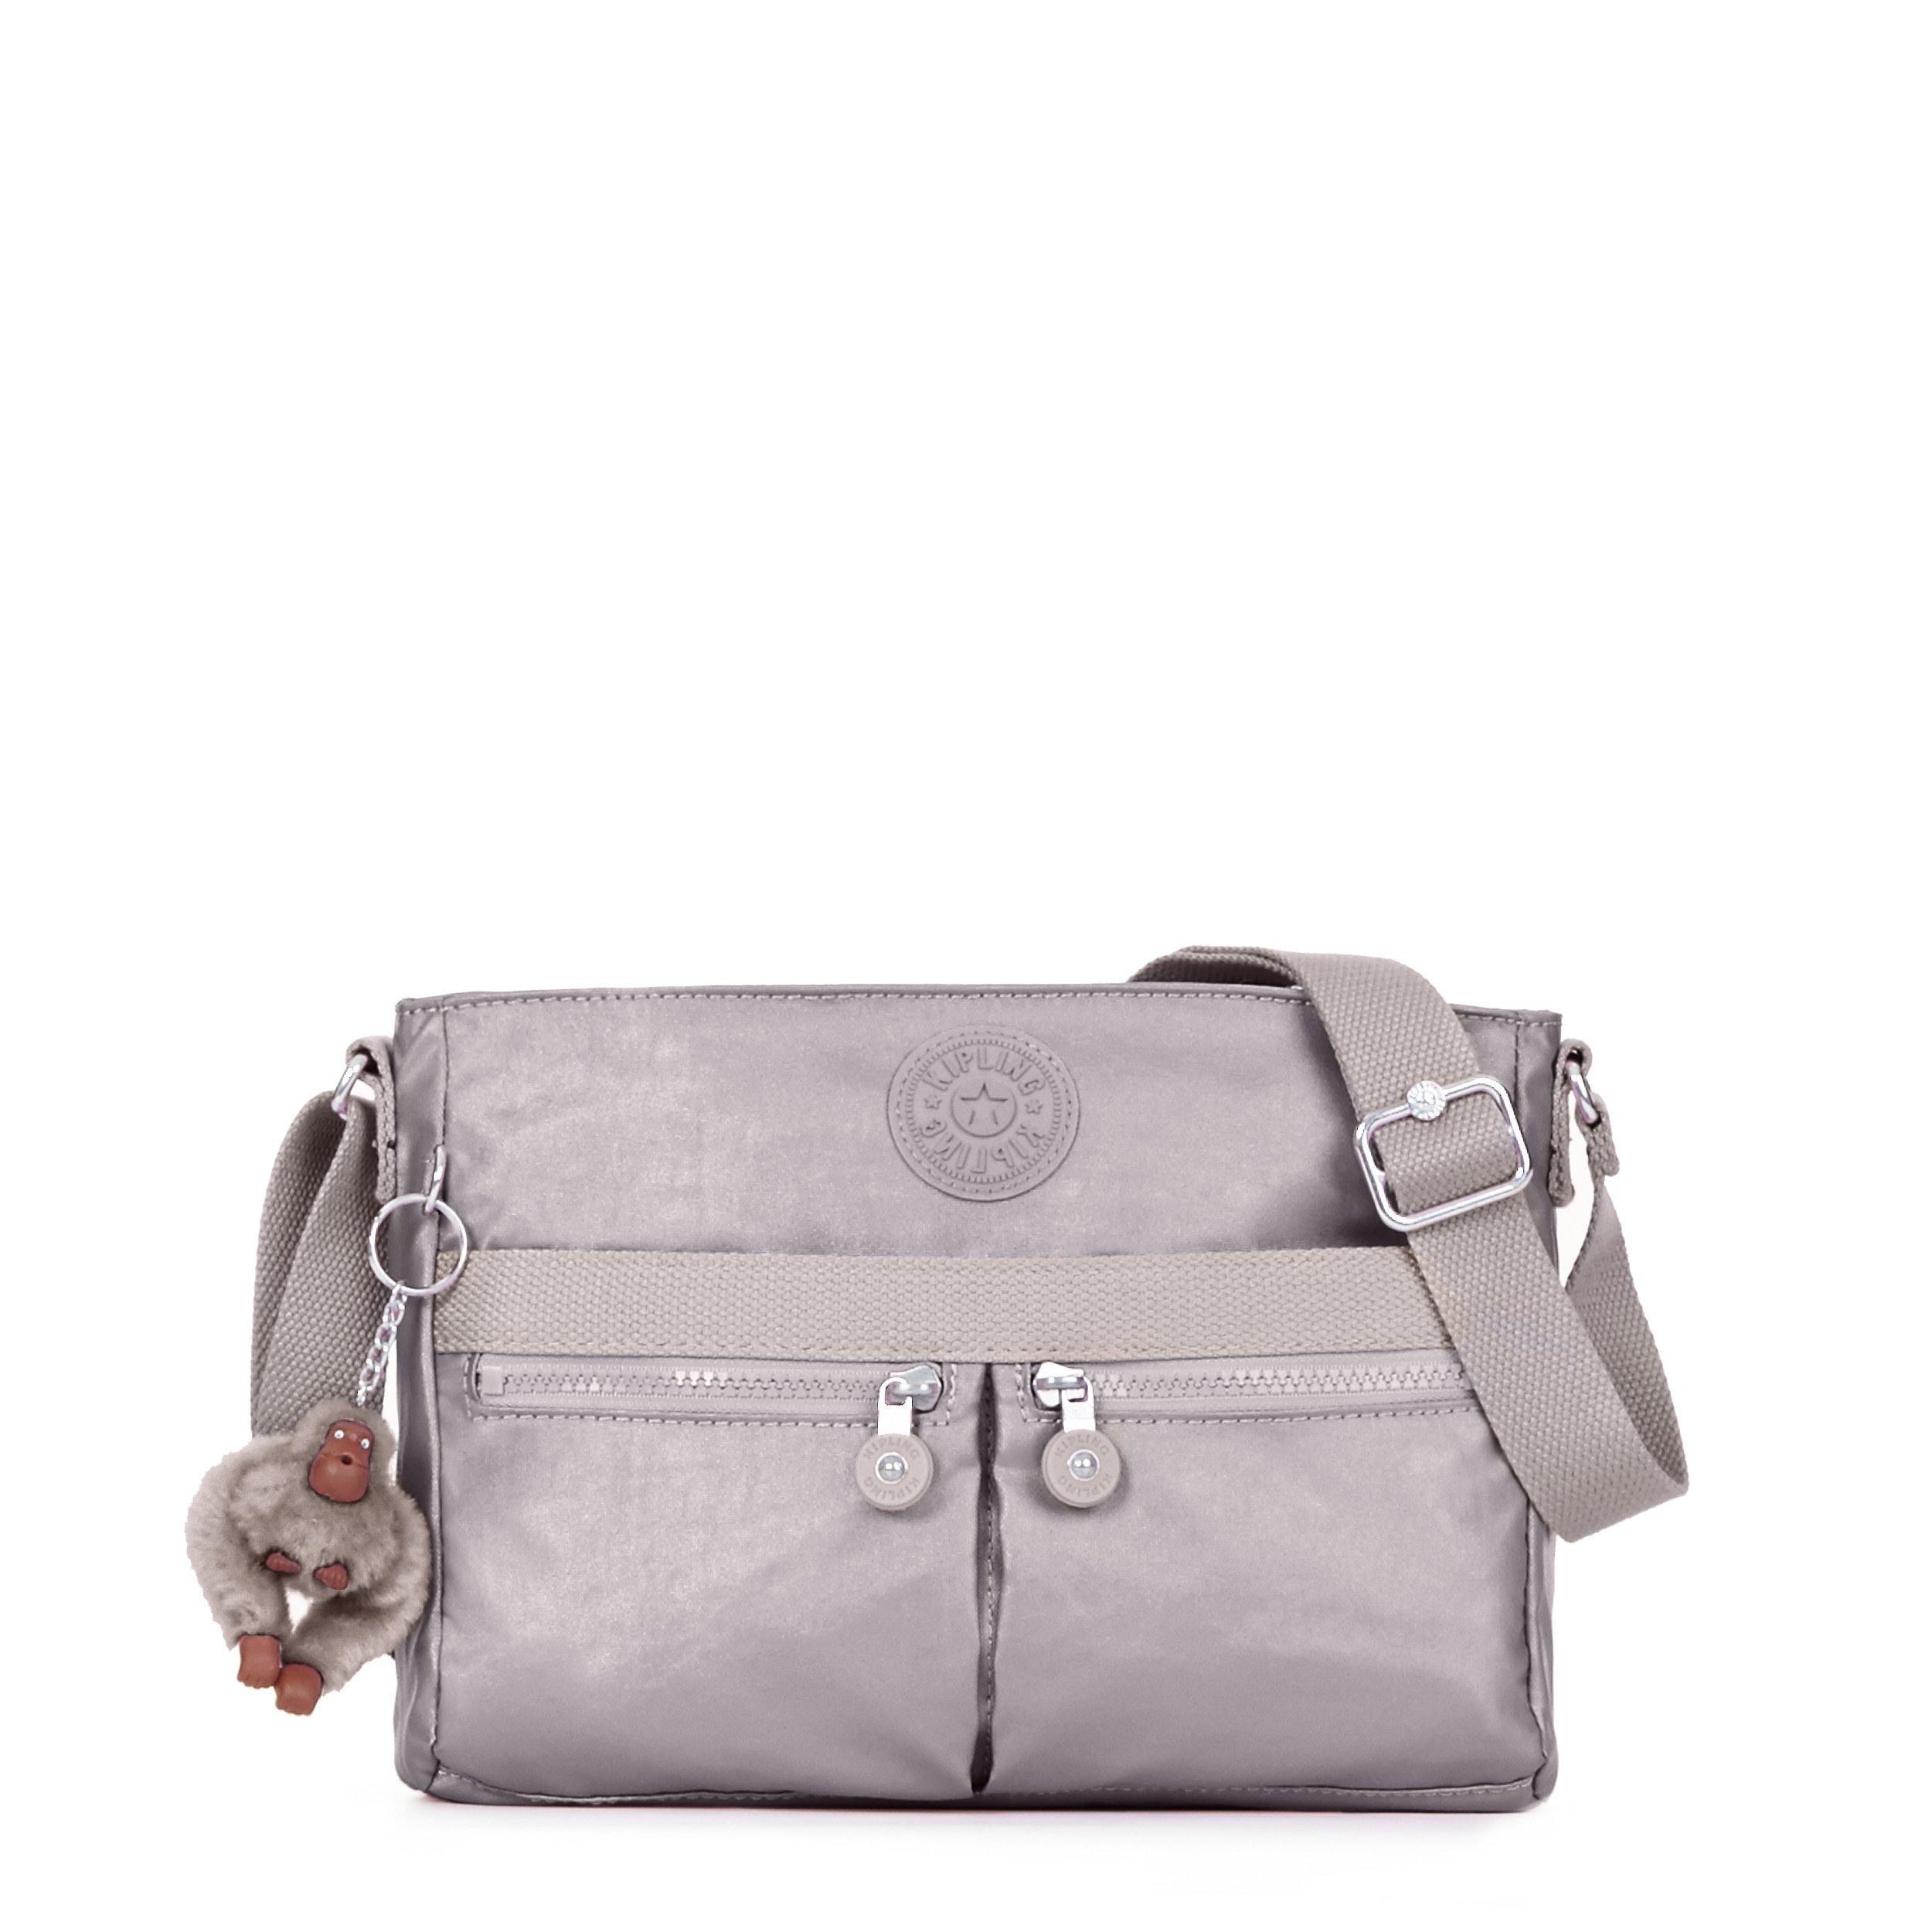 Kipling Women's Angie Solid Crossbody Bag